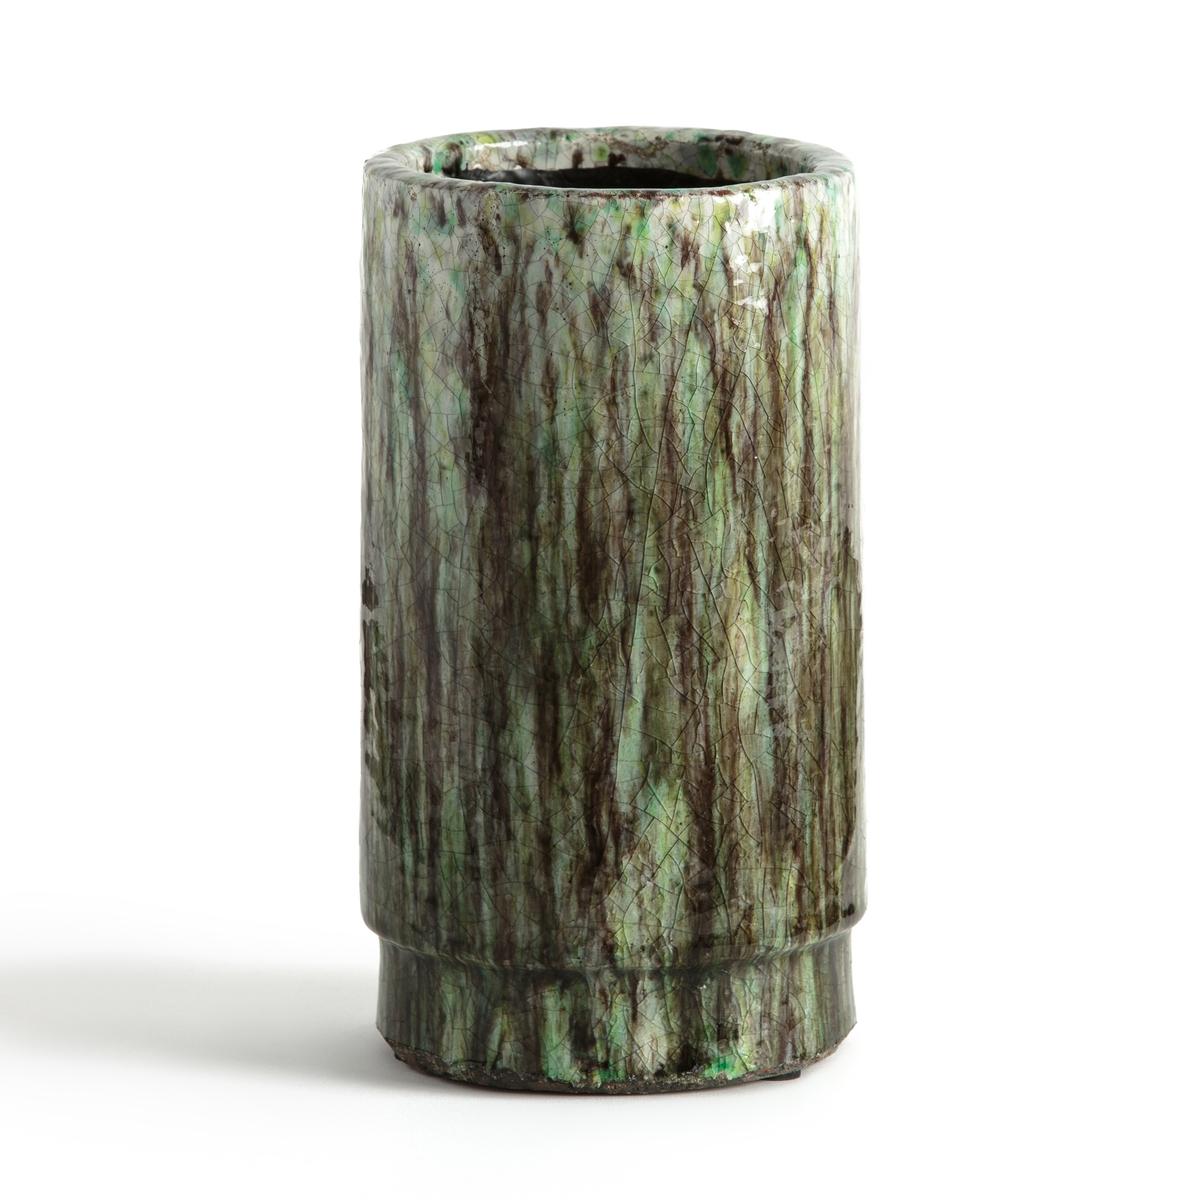 Кашпо из керамики  H27 см, Vécordie